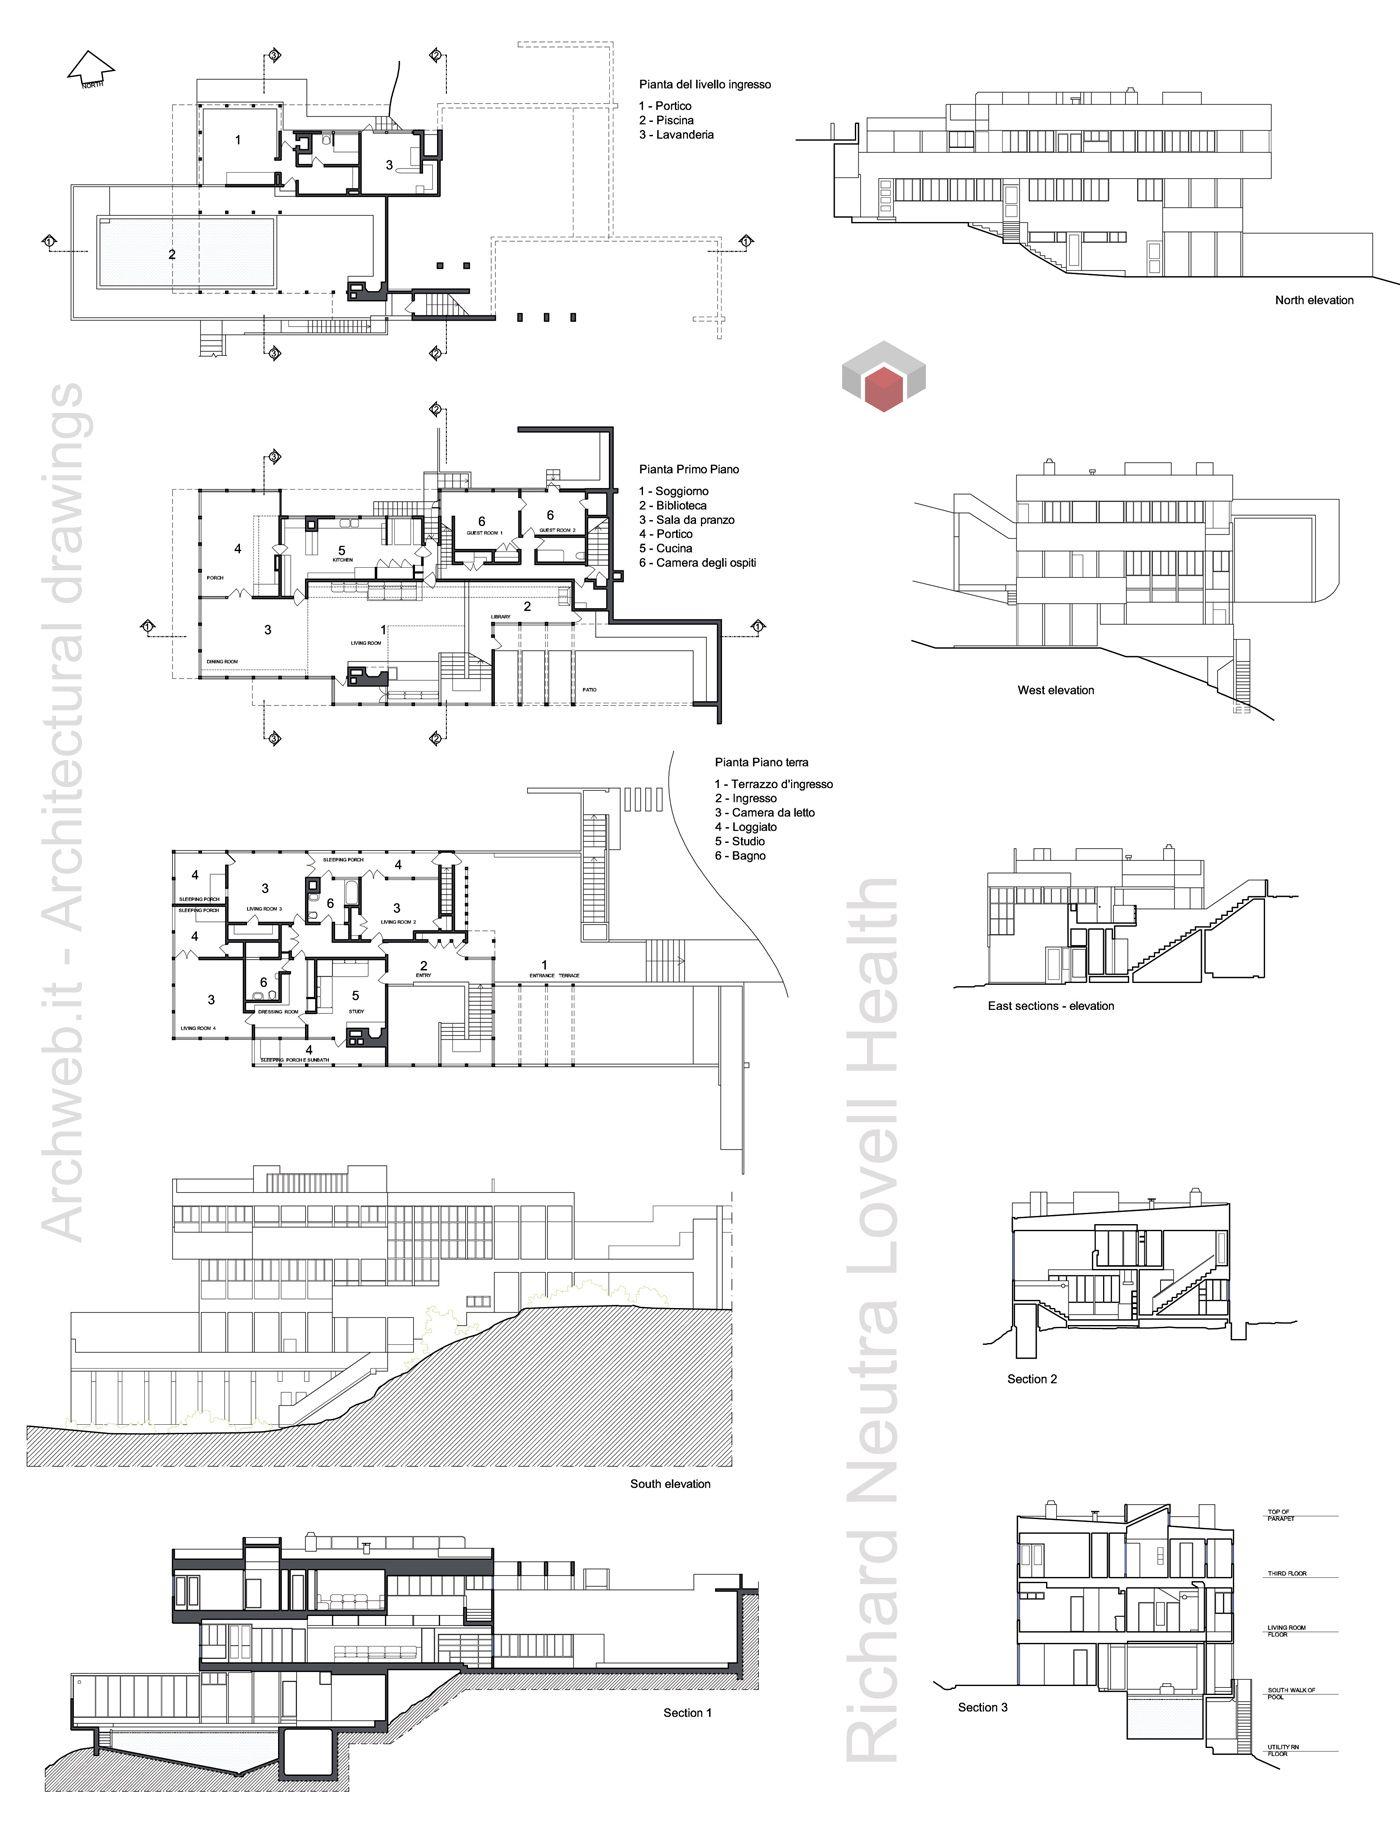 Lovell Health House Los Angeles CA 192729  Richard Neutra  Archweb  archi  Richard Neutra  Arquitectura Casas